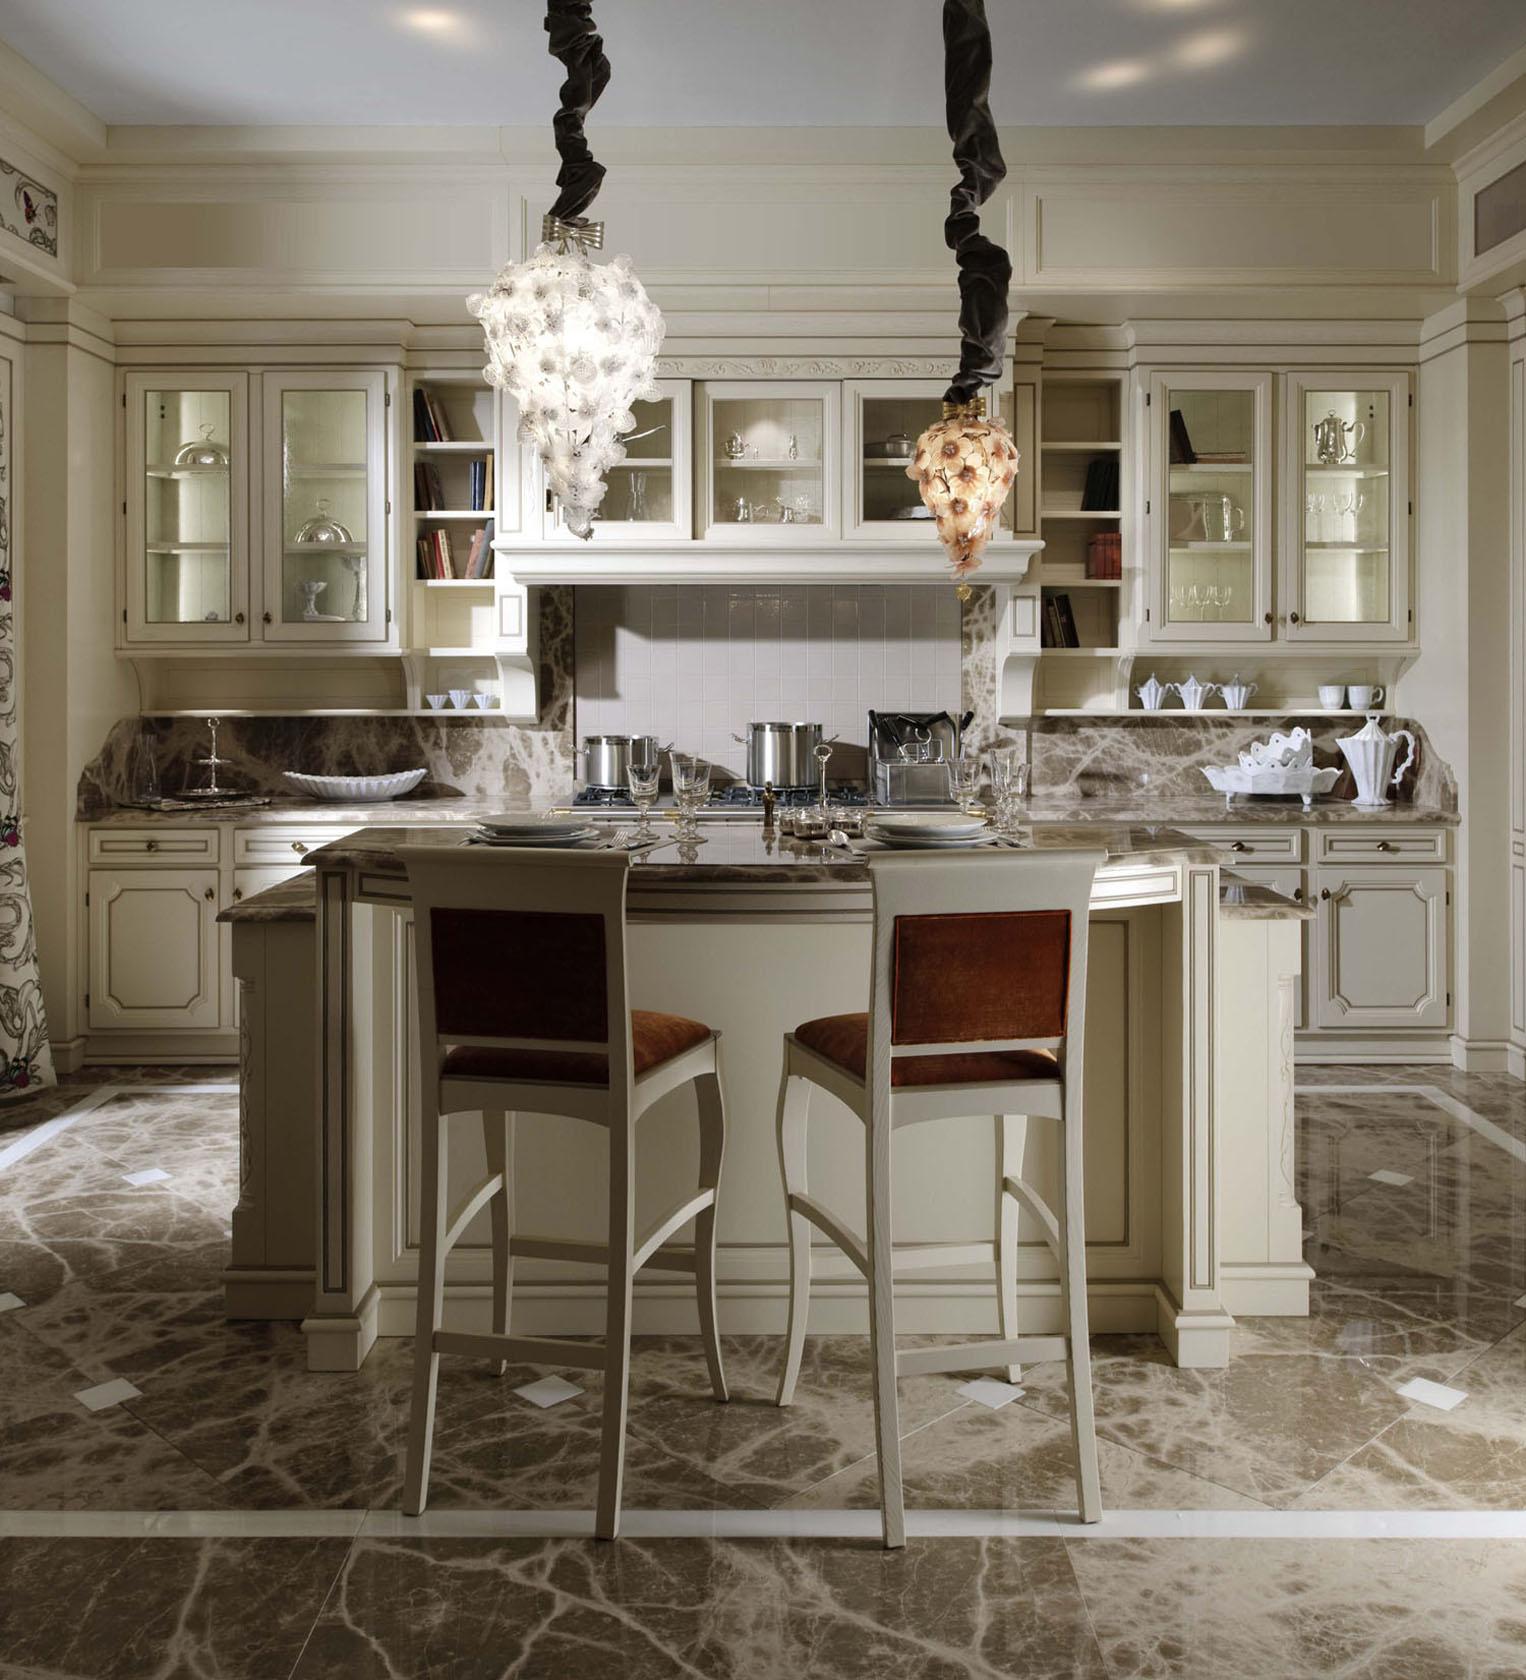 Emejing L Ottocento Cucina Pictures - Idee Per Una Casa Moderna ...